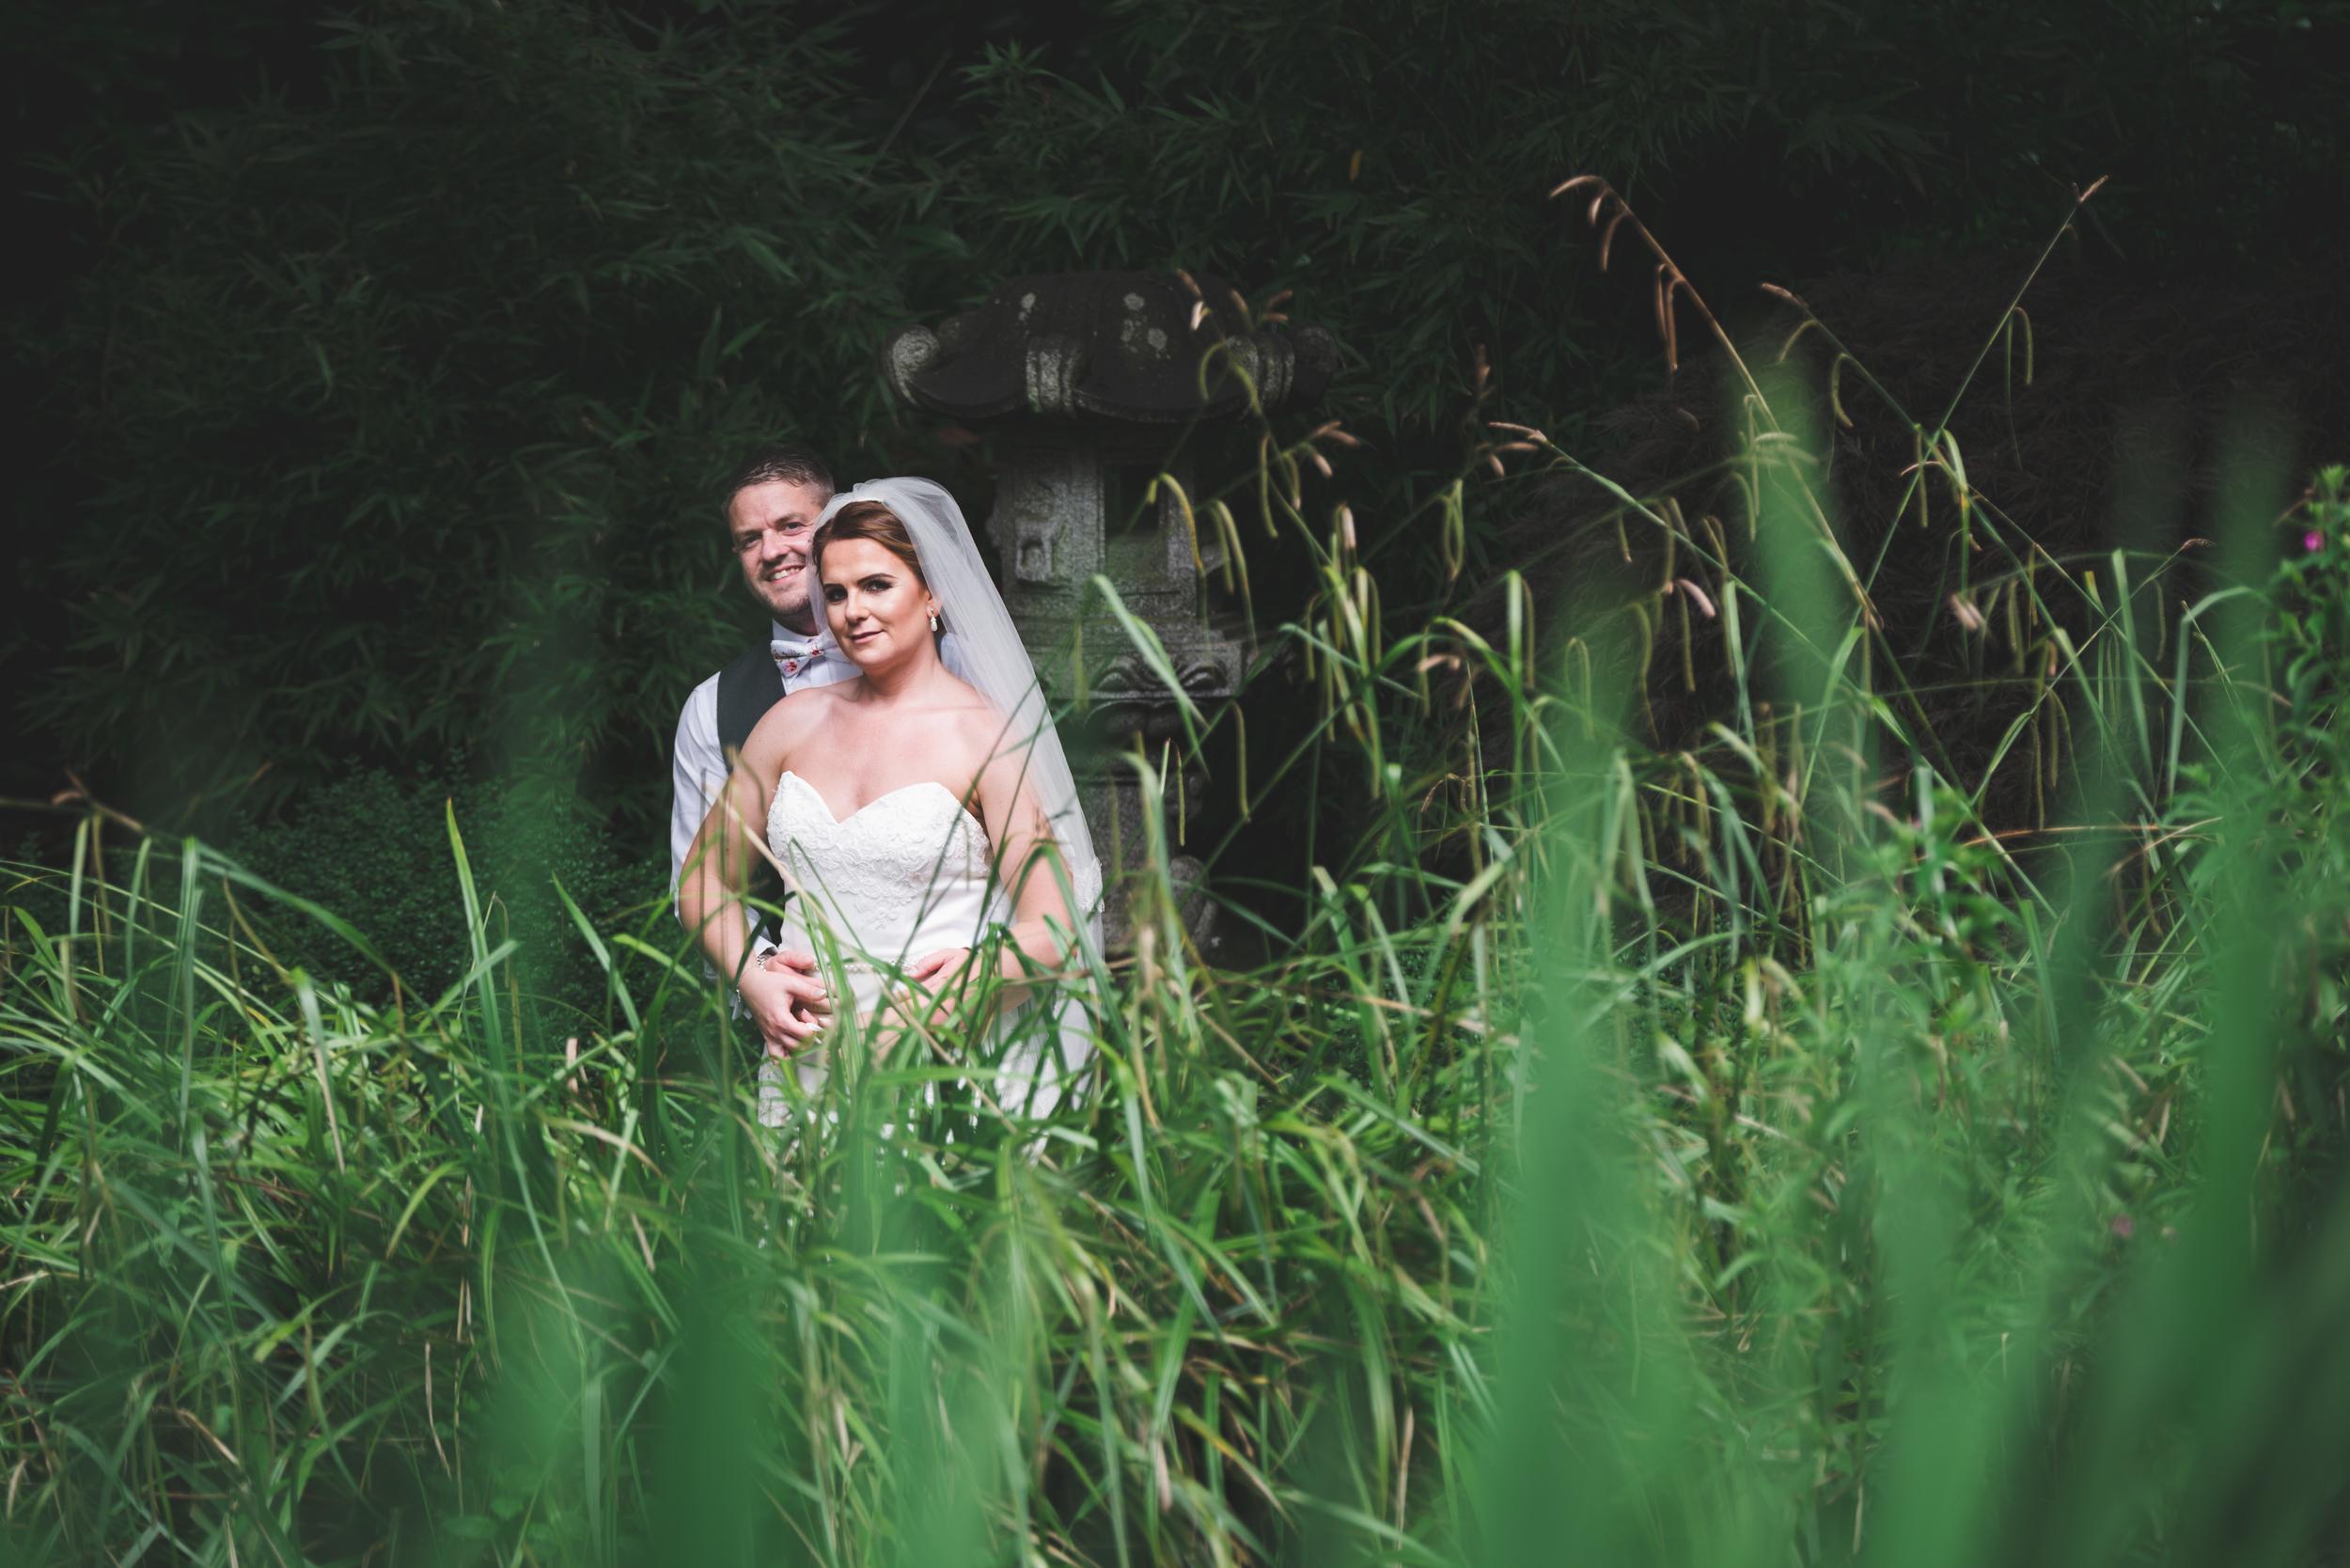 Northern Ireland Wedding Photographer purephotoni lady dixons park bride groom portraits